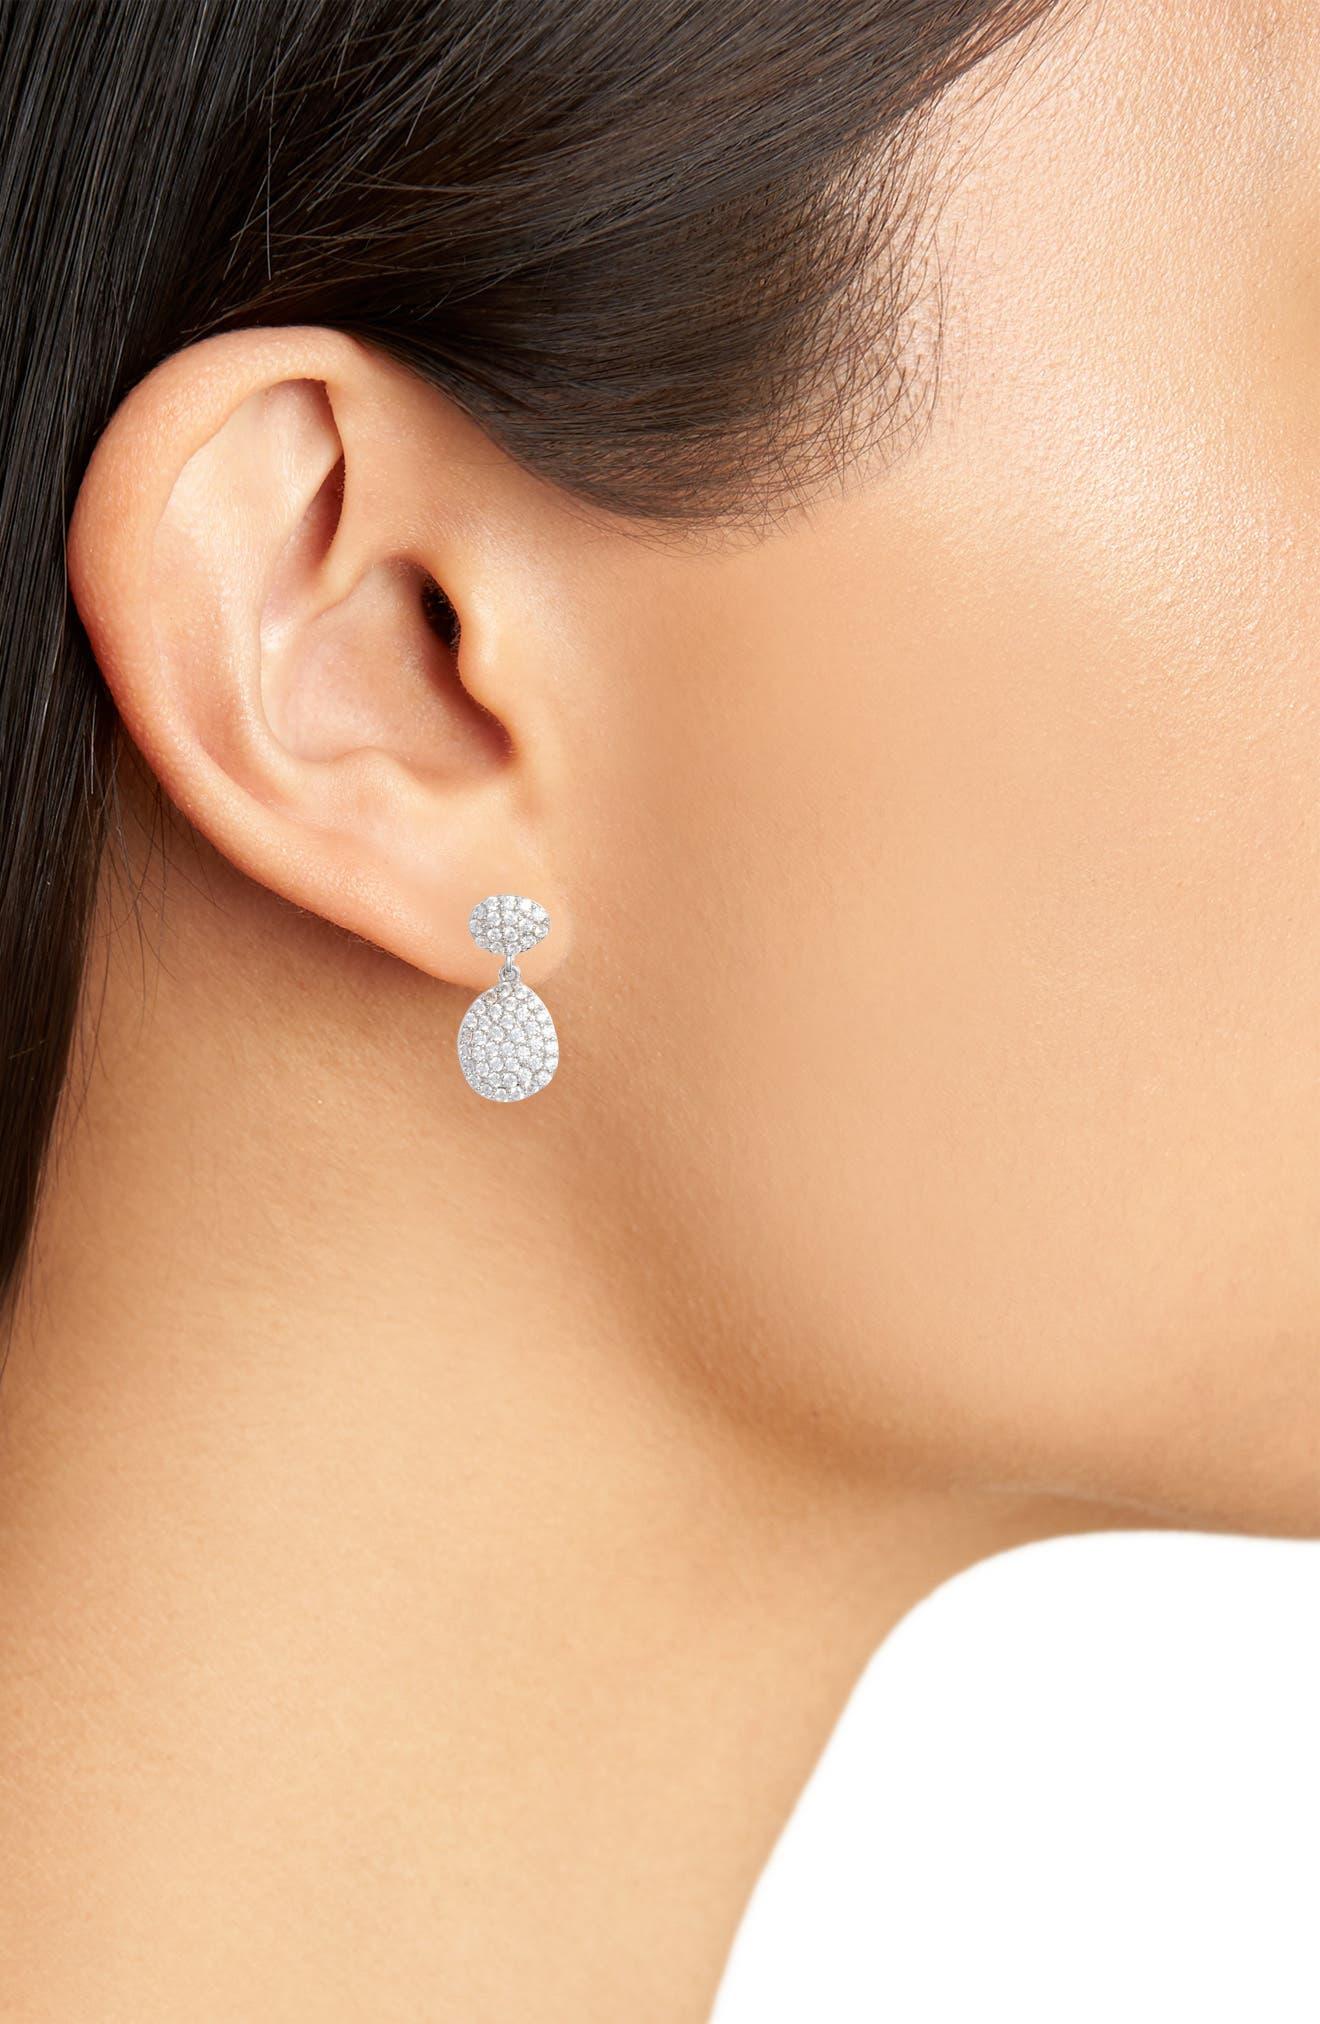 NORDSTROM,                             Pavé Spheres Teardrop Earrings,                             Alternate thumbnail 2, color,                             040